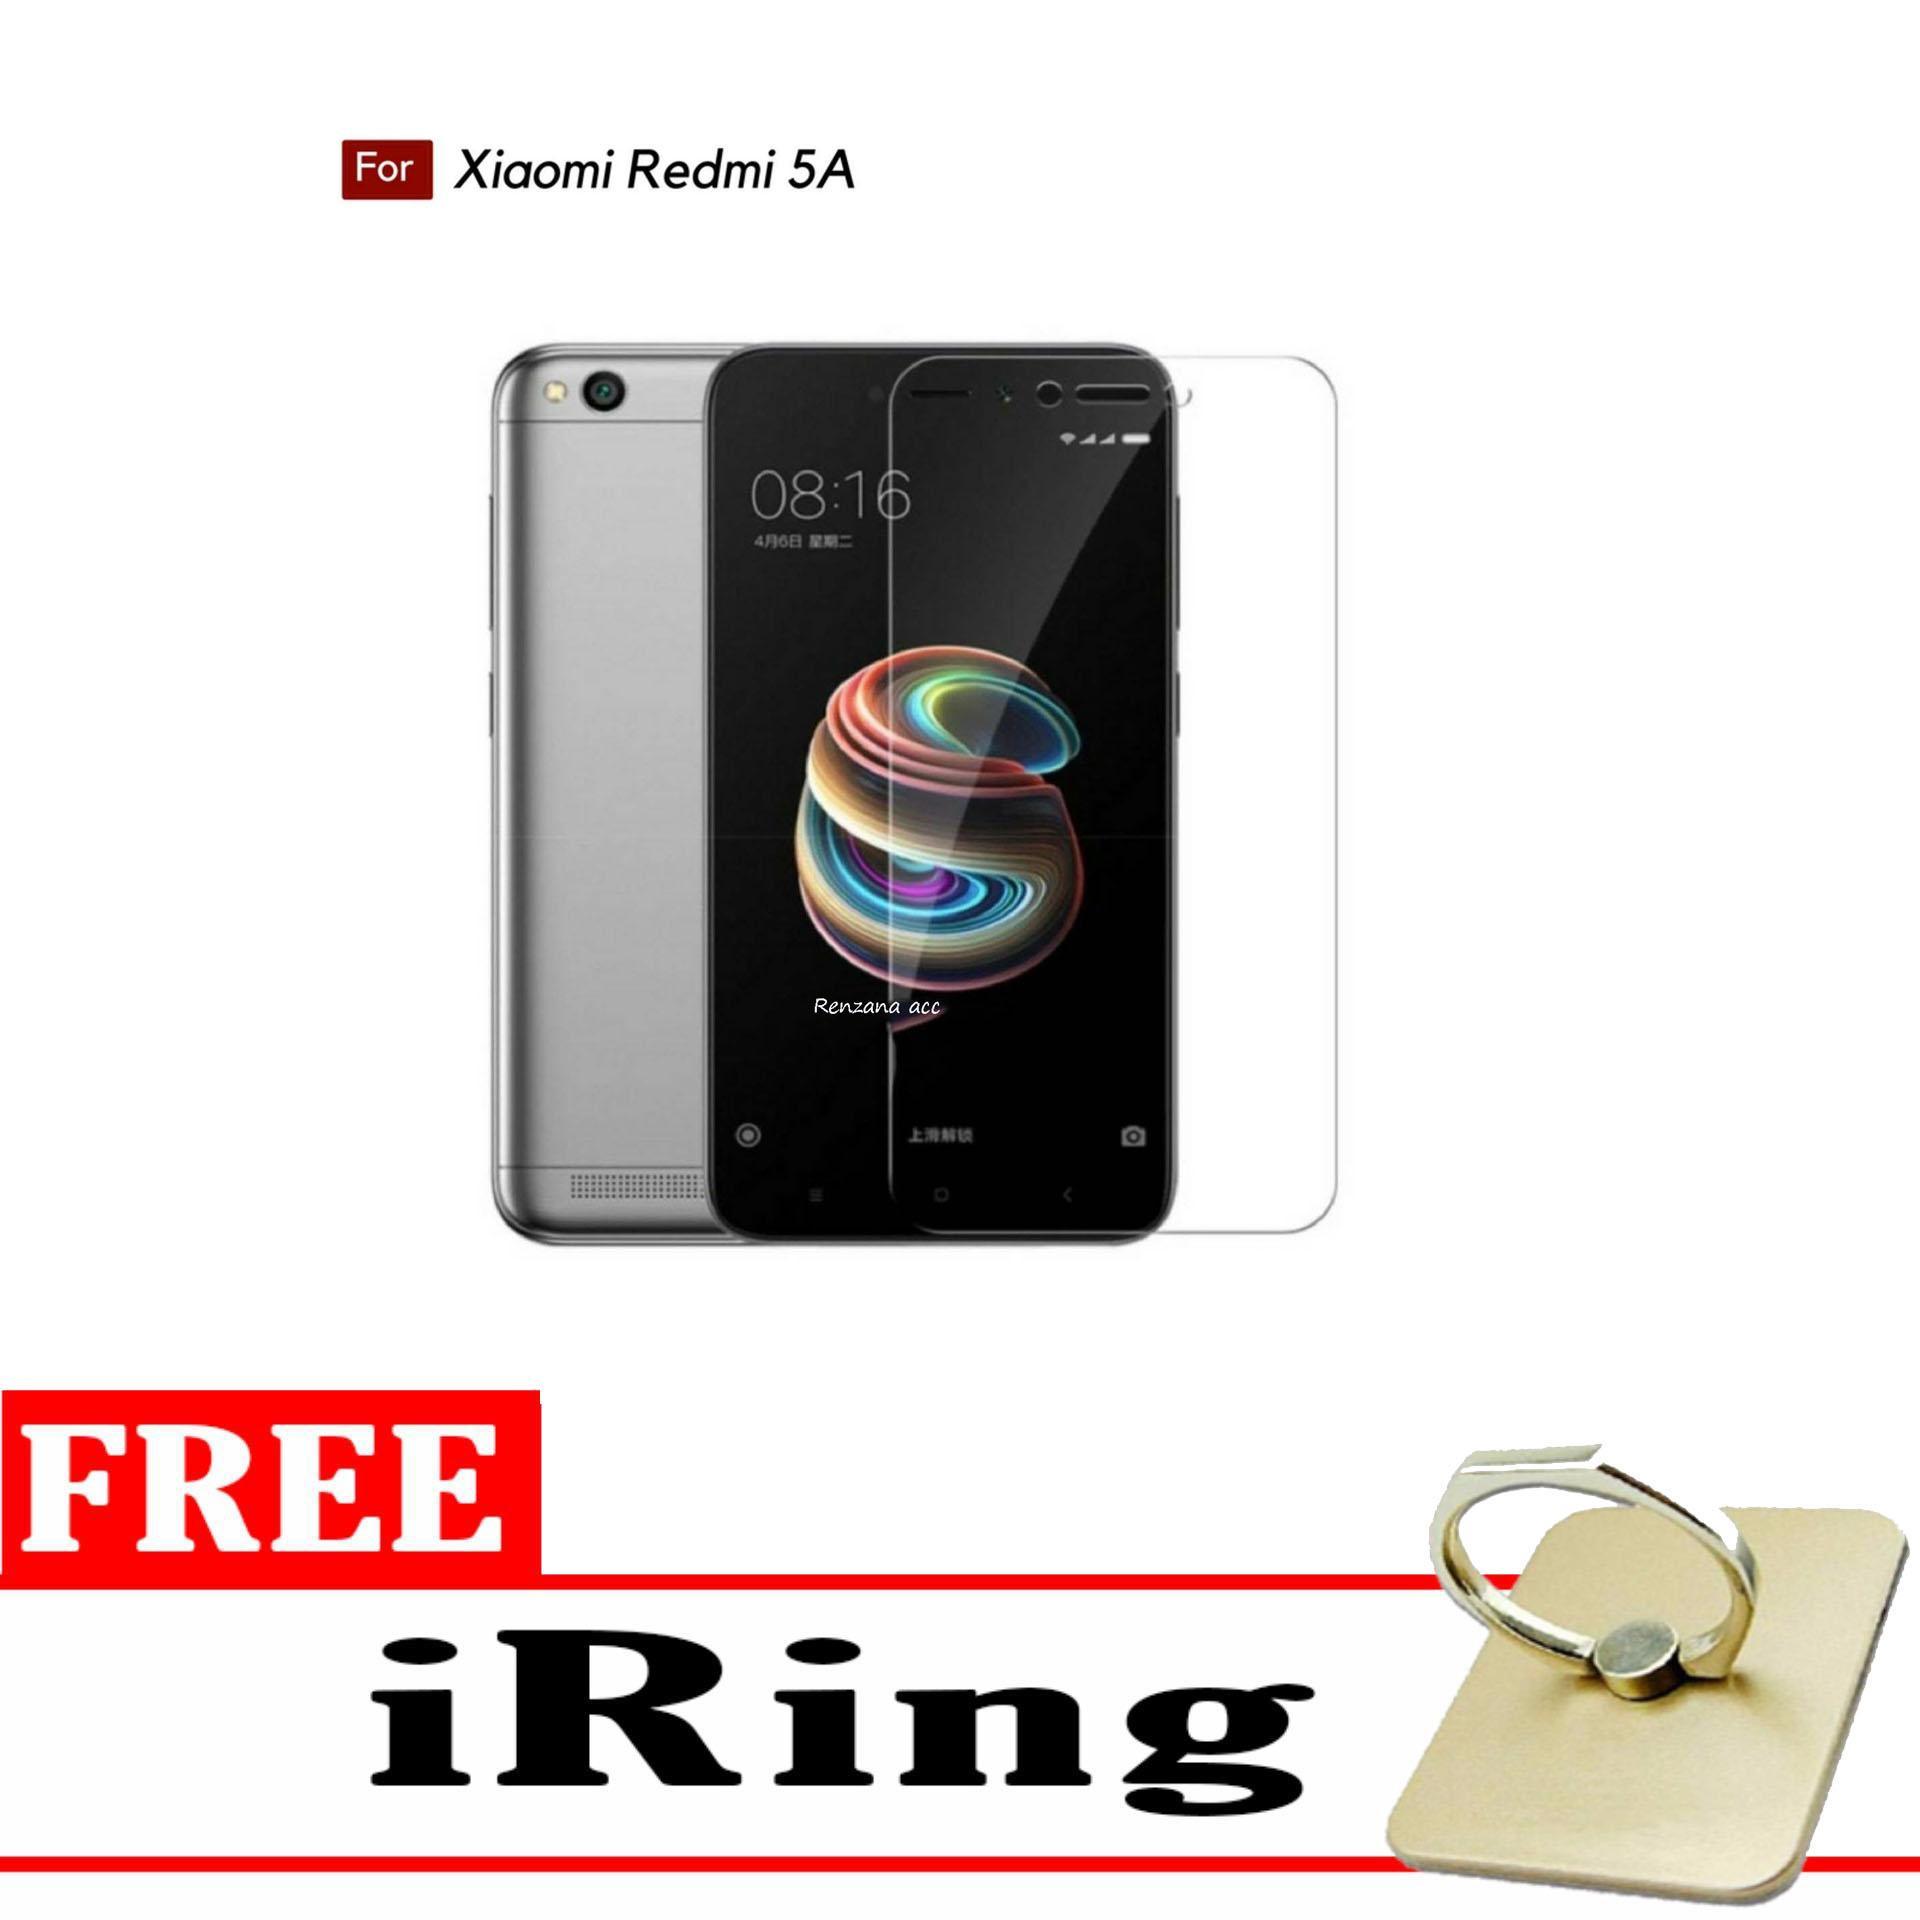 Tempered Glass Screen Protector Anti Gores Kaca Xiaomi Redmi 5A - Clea + FREE Iring